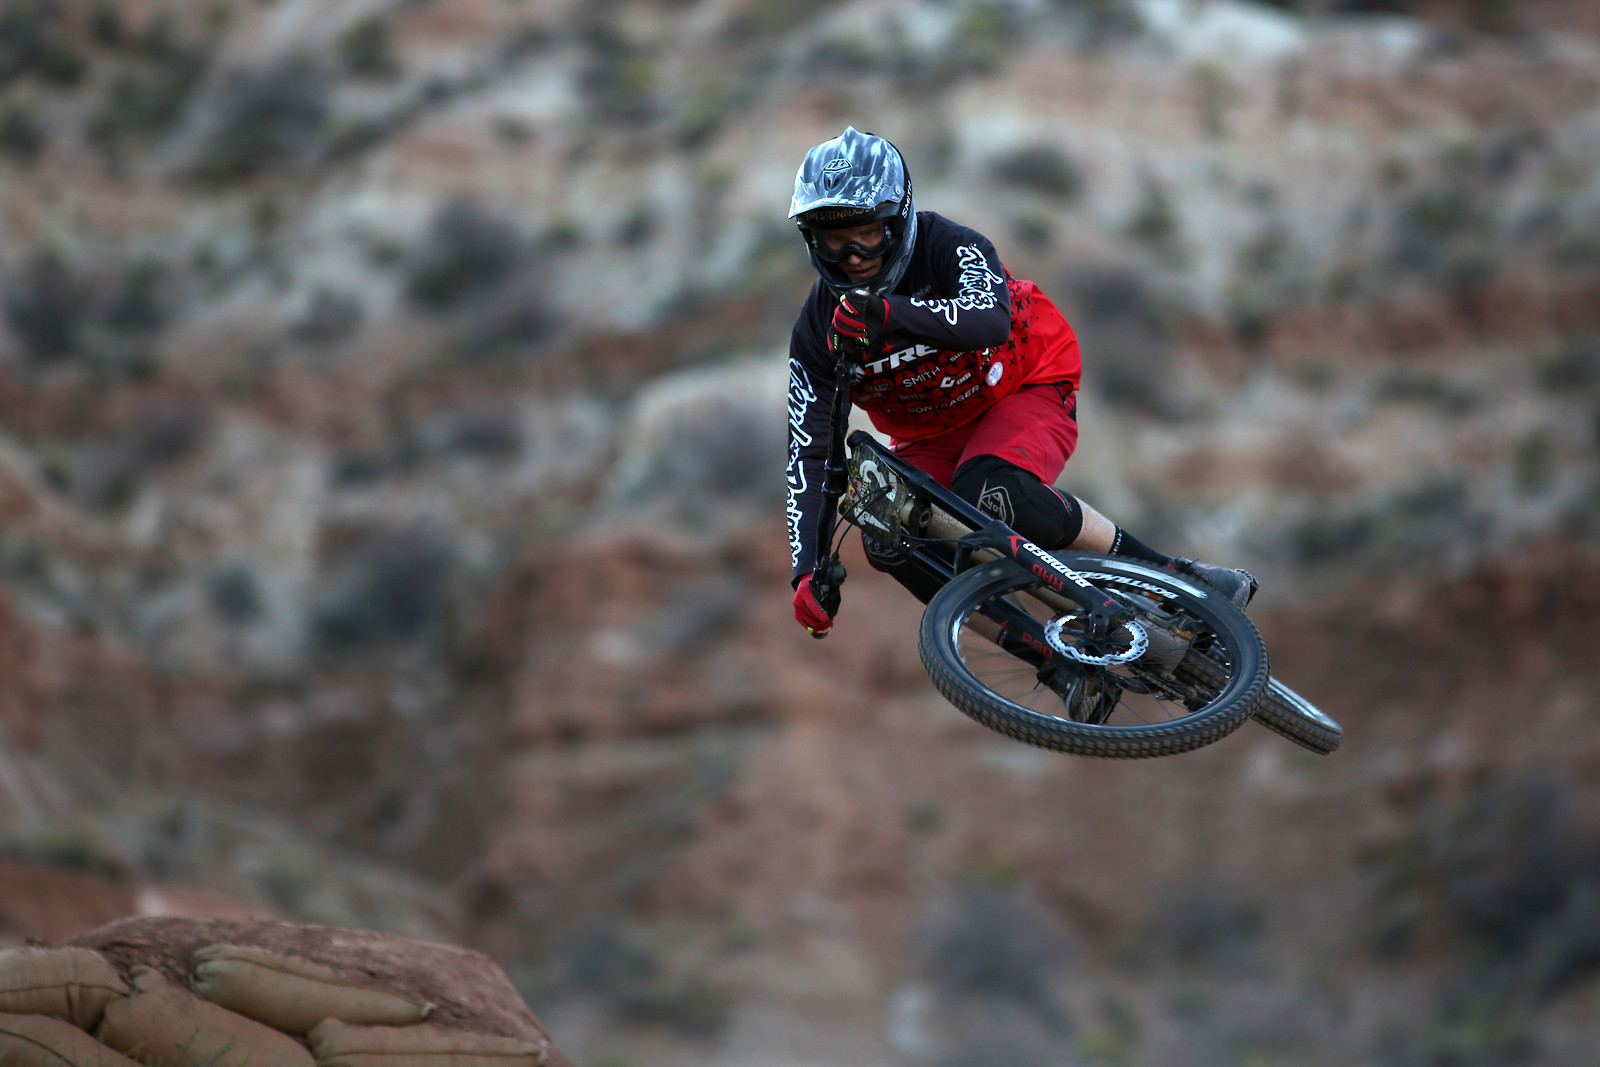 5D3A5428 - mjmiller613 - Mountain Biking Pictures - Vital MTB